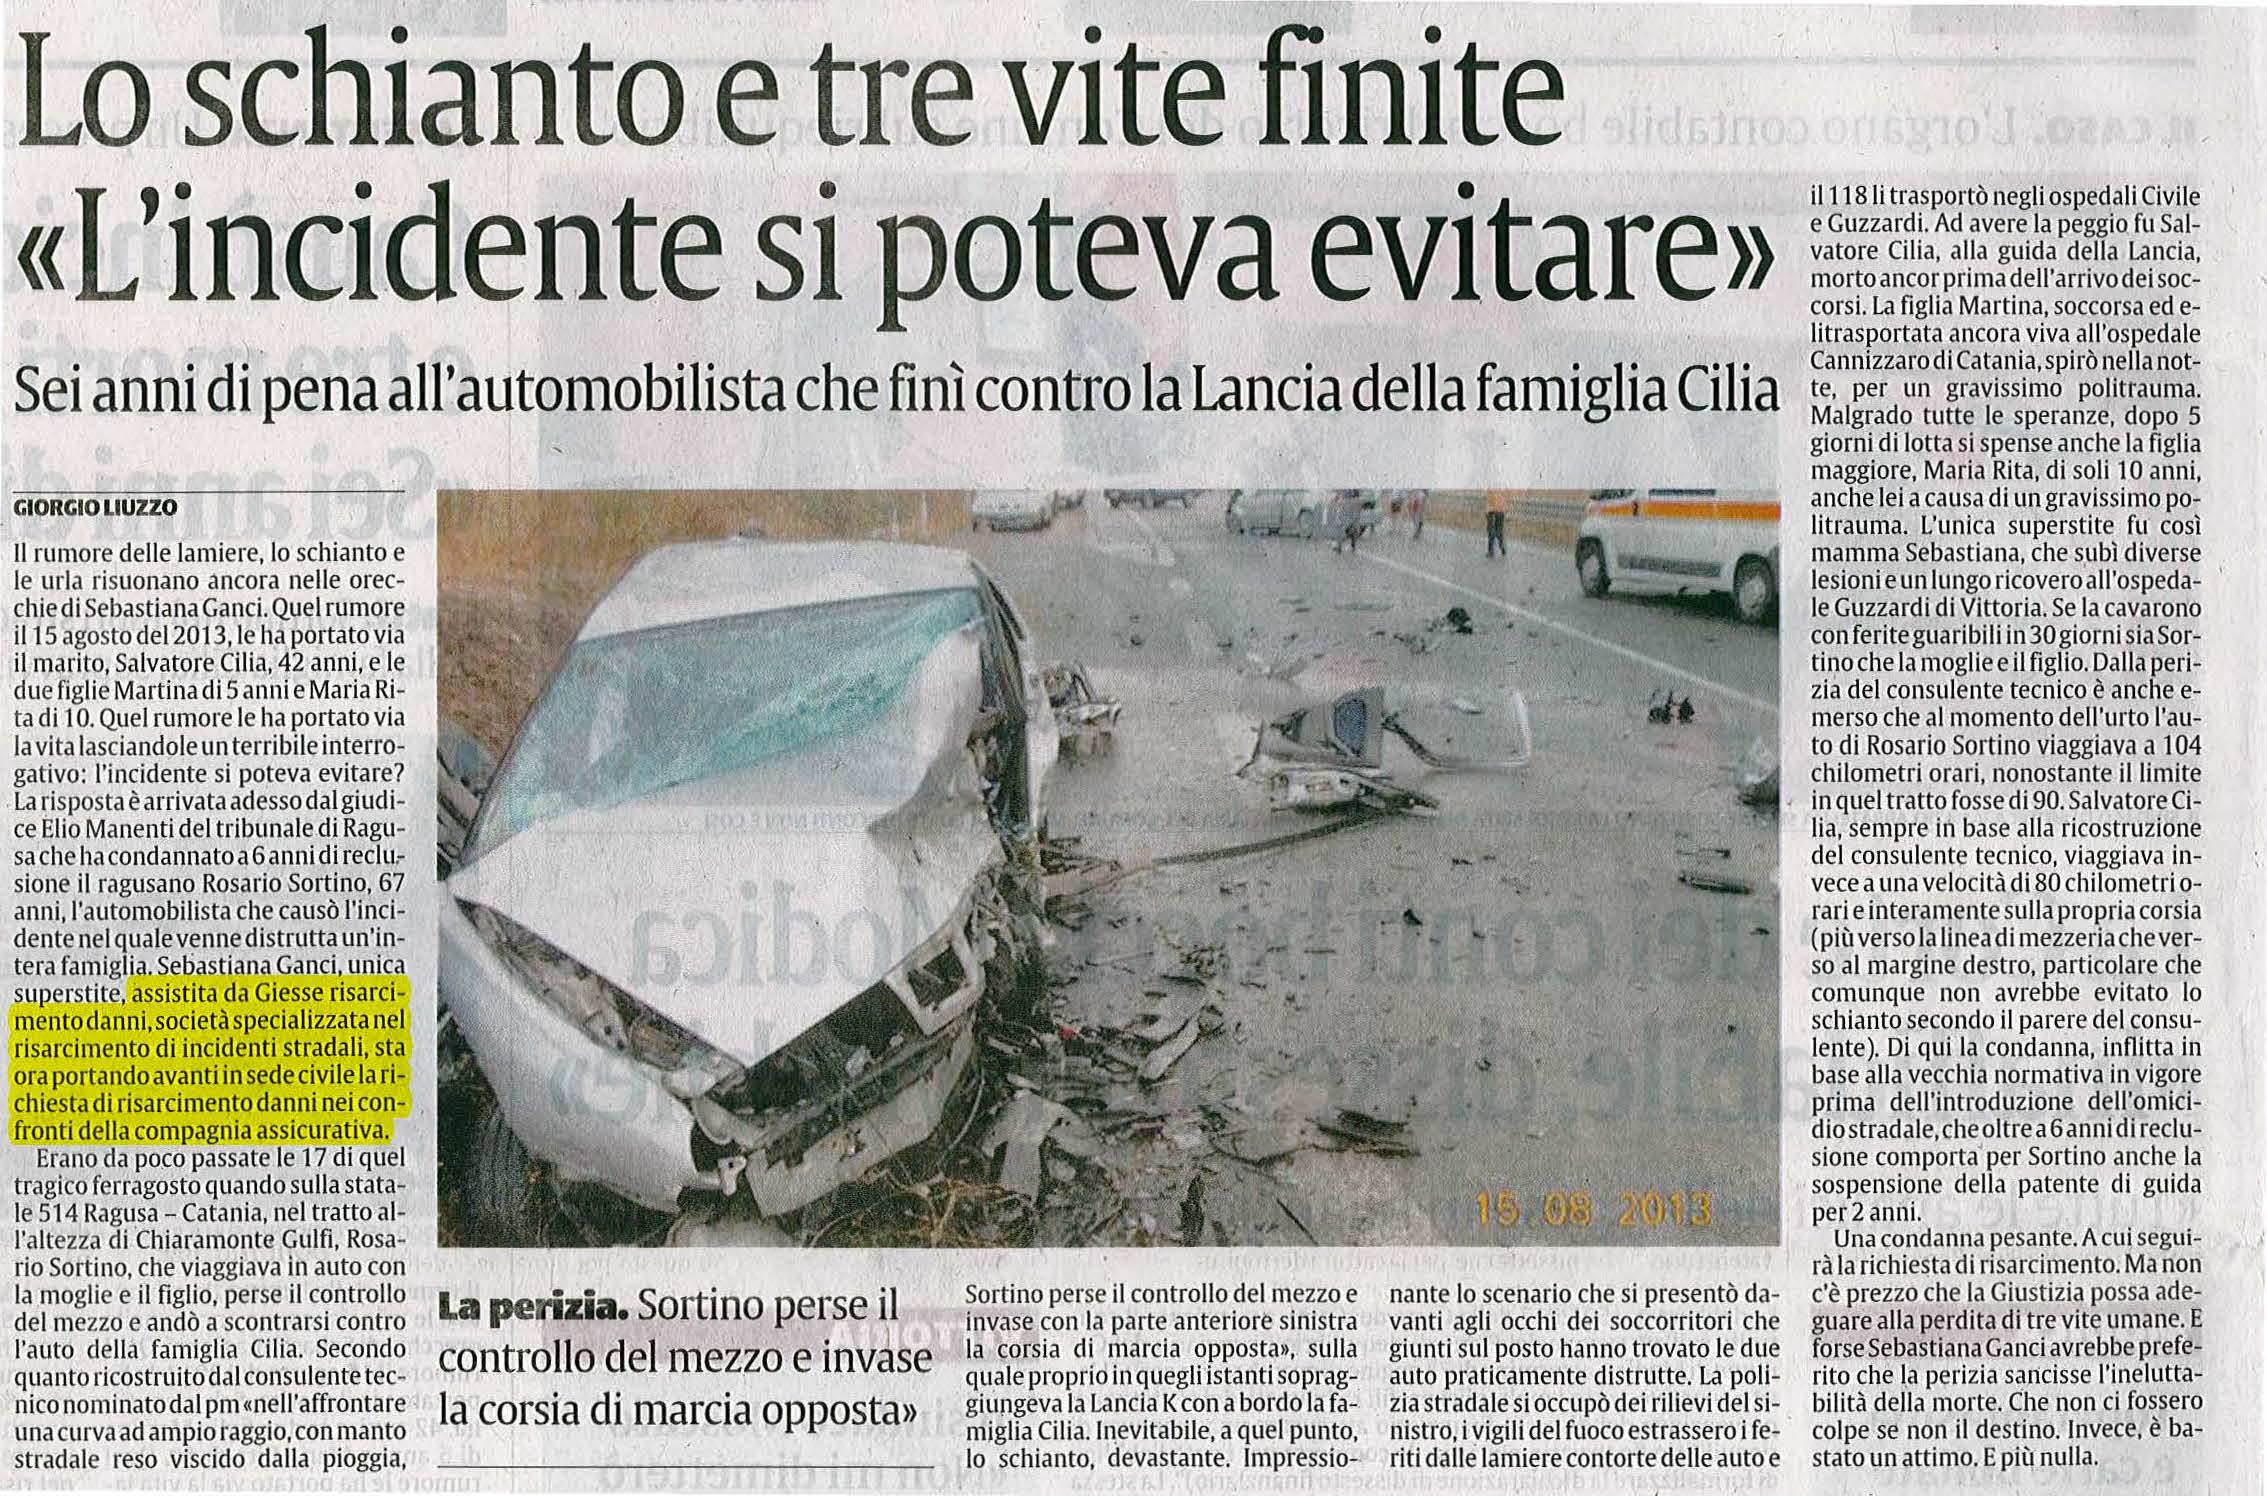 Quotidiano incidente stradale Ragusa Catania risarcimento danni Giesse